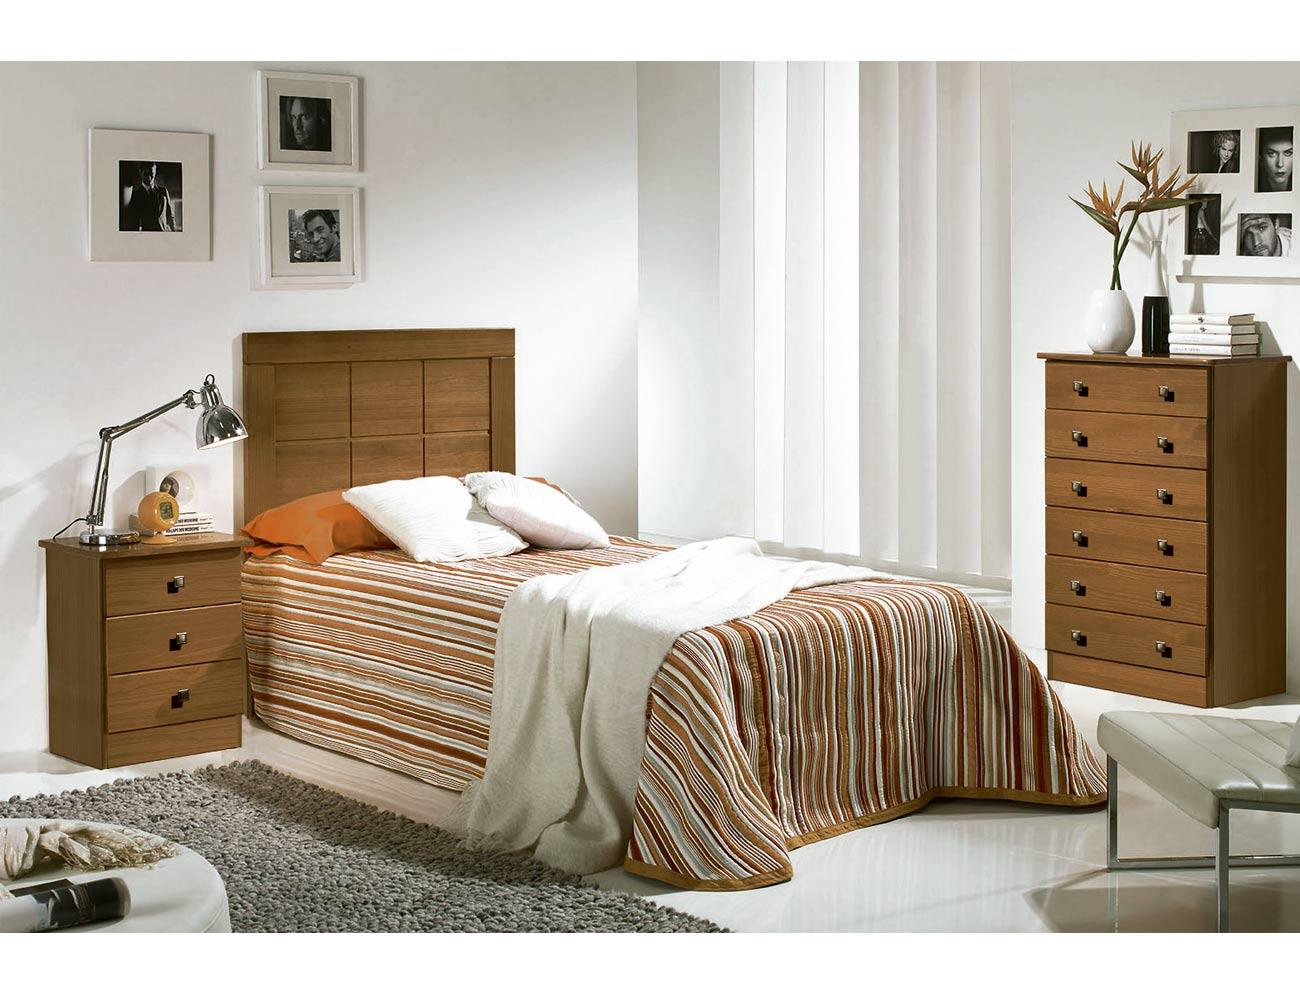 Dormitorio juvenil kenia madera nogal2